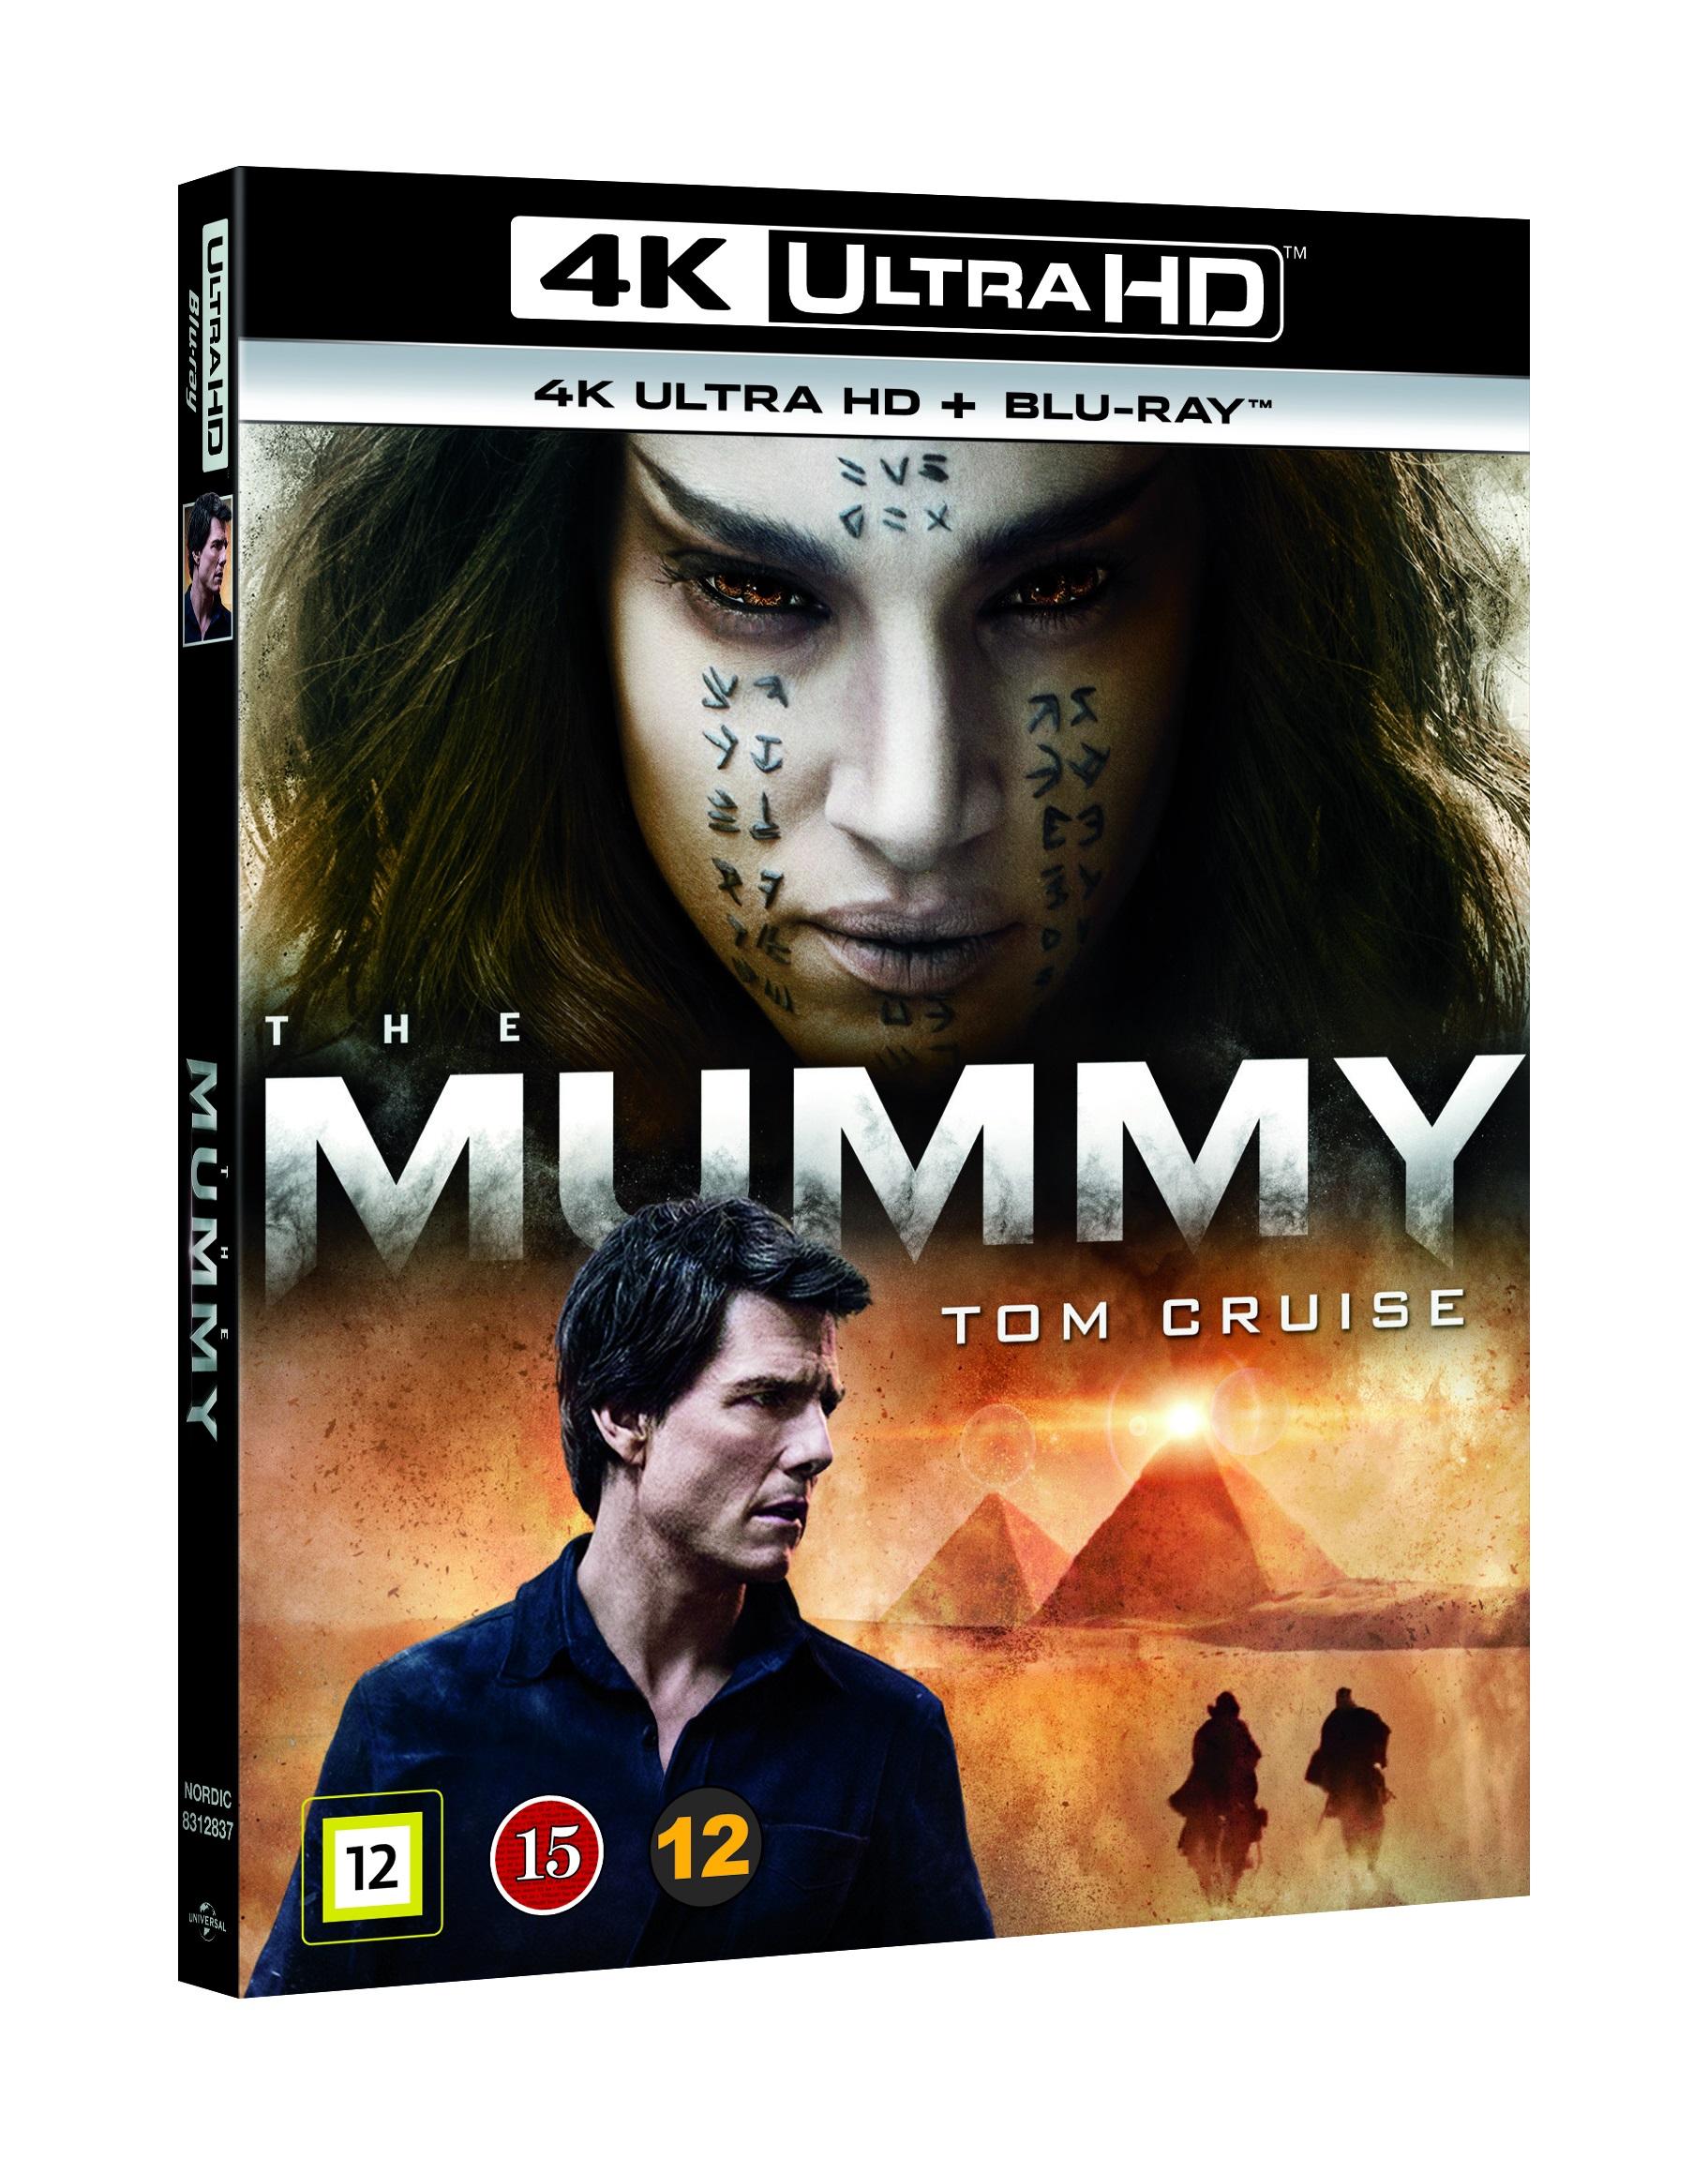 The Mummy - Tom Cruise - Film - JV-UPN - 5053083128371 - October 26, 2017